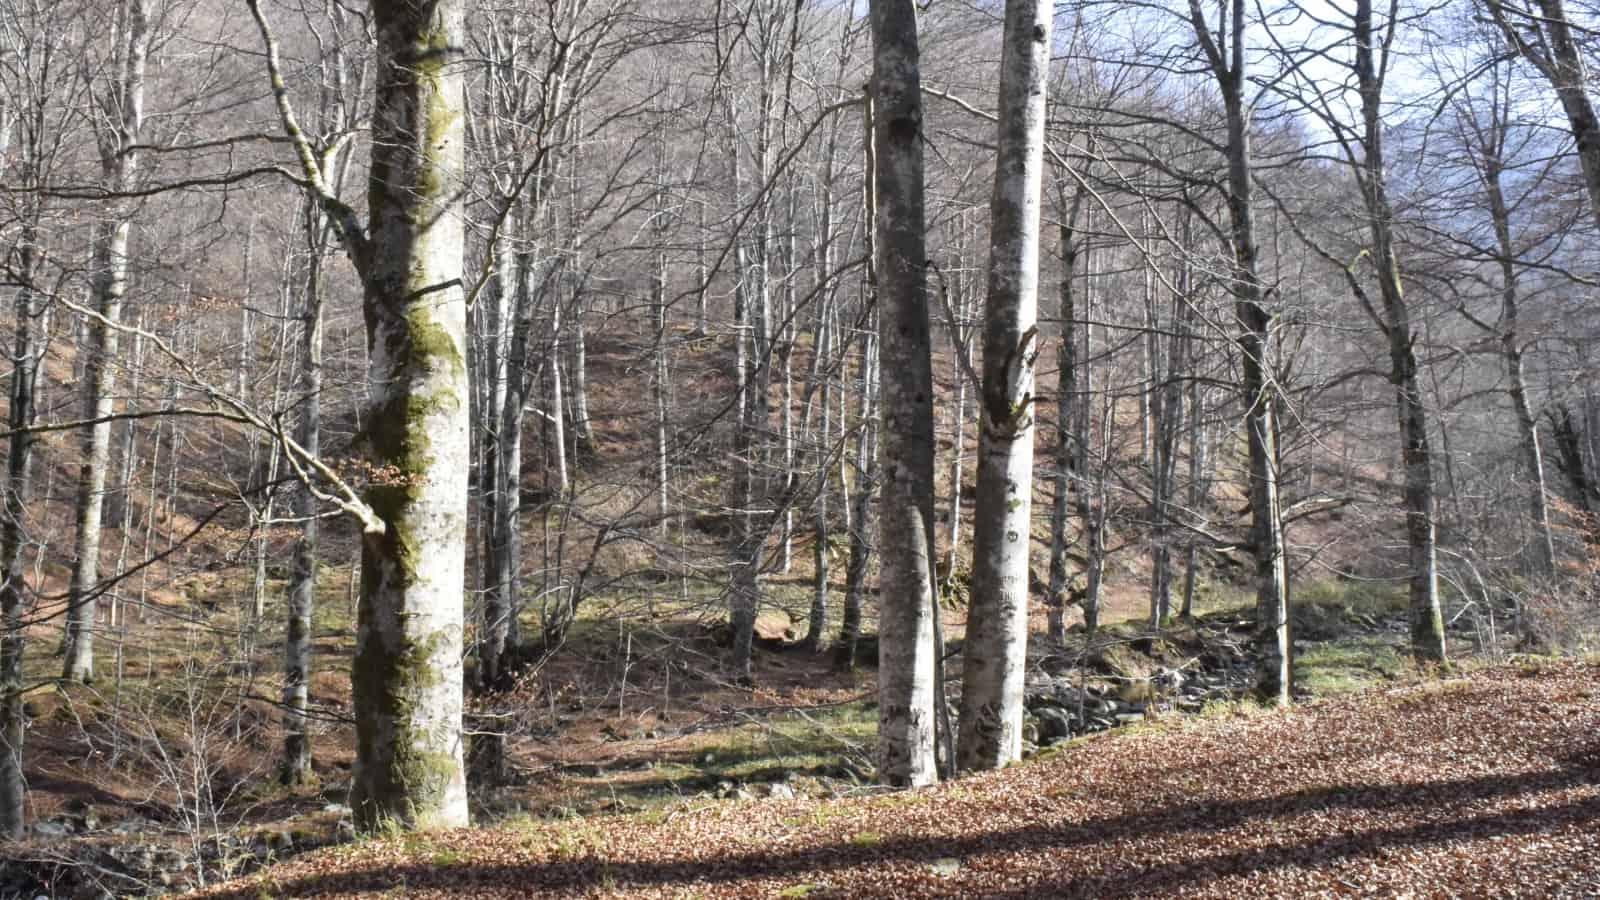 Beech forest - Photo: Central Balkan National Park/Stoyan Hristov